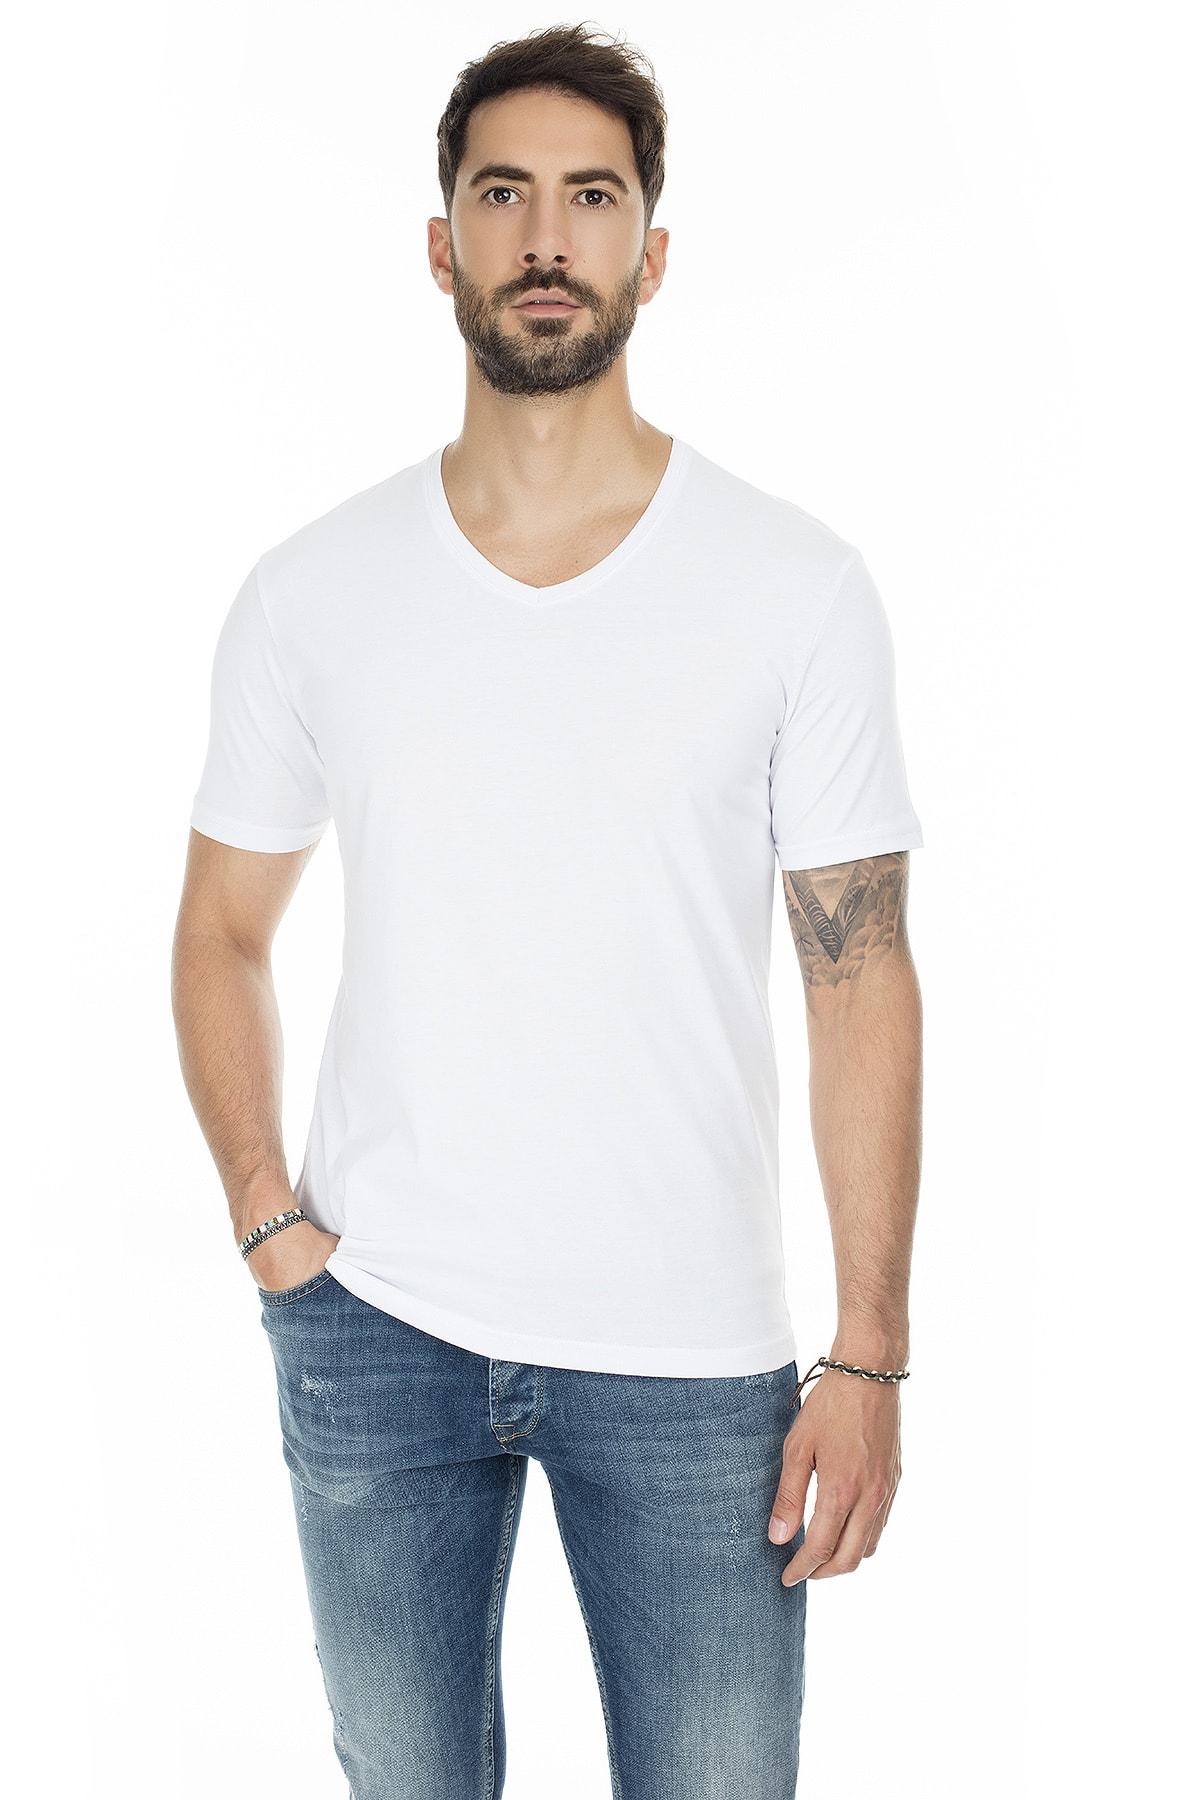 Buratti Erkek BEYAZ-BEYAZ 2'li Paket V Yaka Slim Fit Pamuklu Basic T Shirt 5722512V2 1